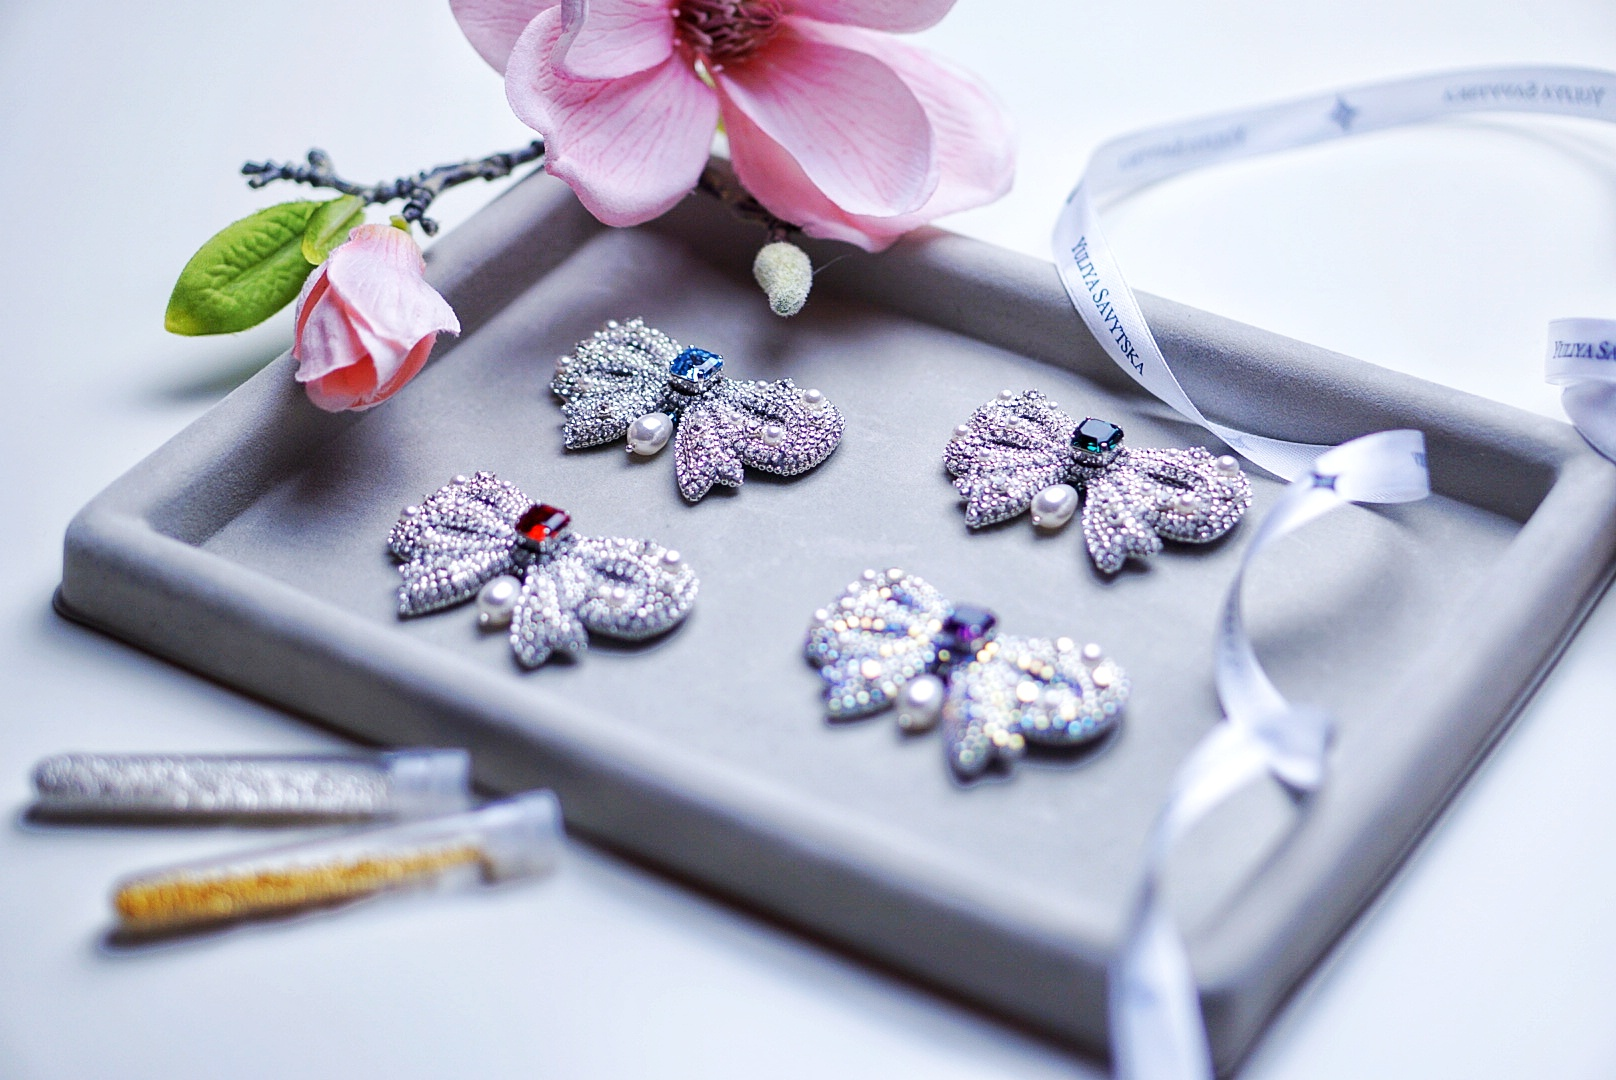 Yuliya Savytska YS Imperial Bows Brooch Collection